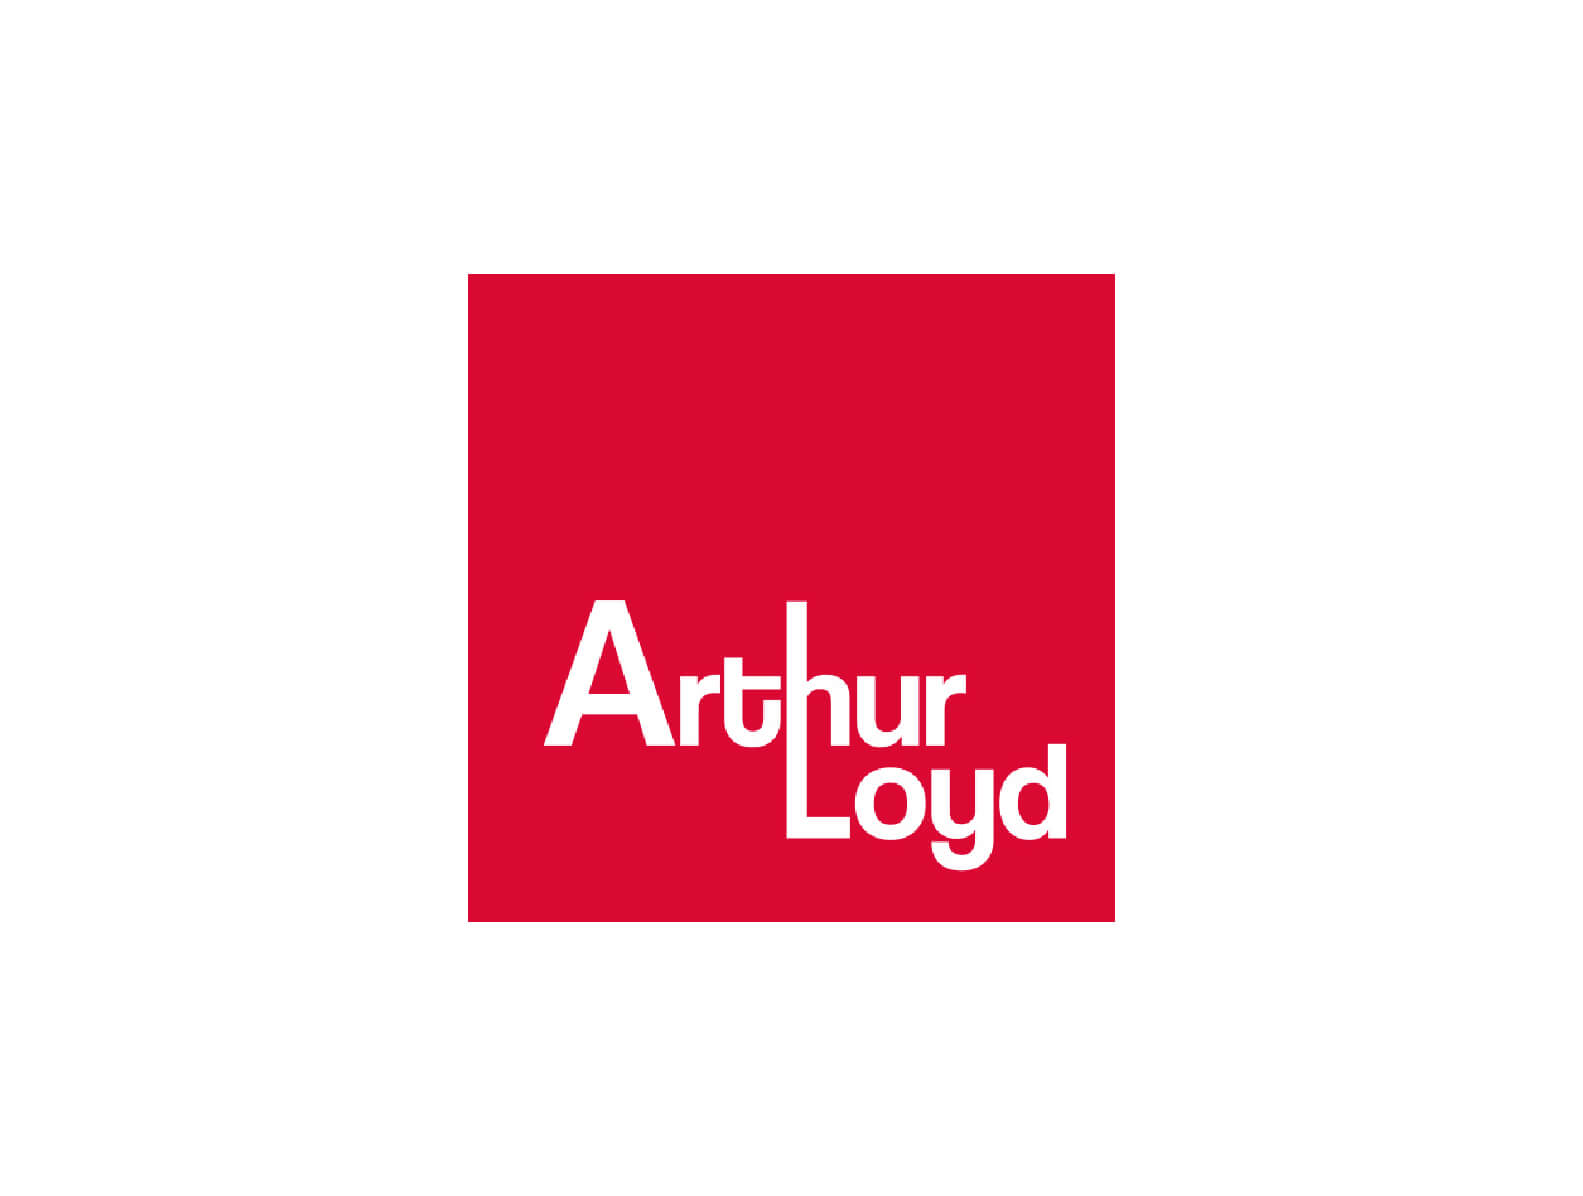 agence kayak communication web lille nord arthur loyd logo